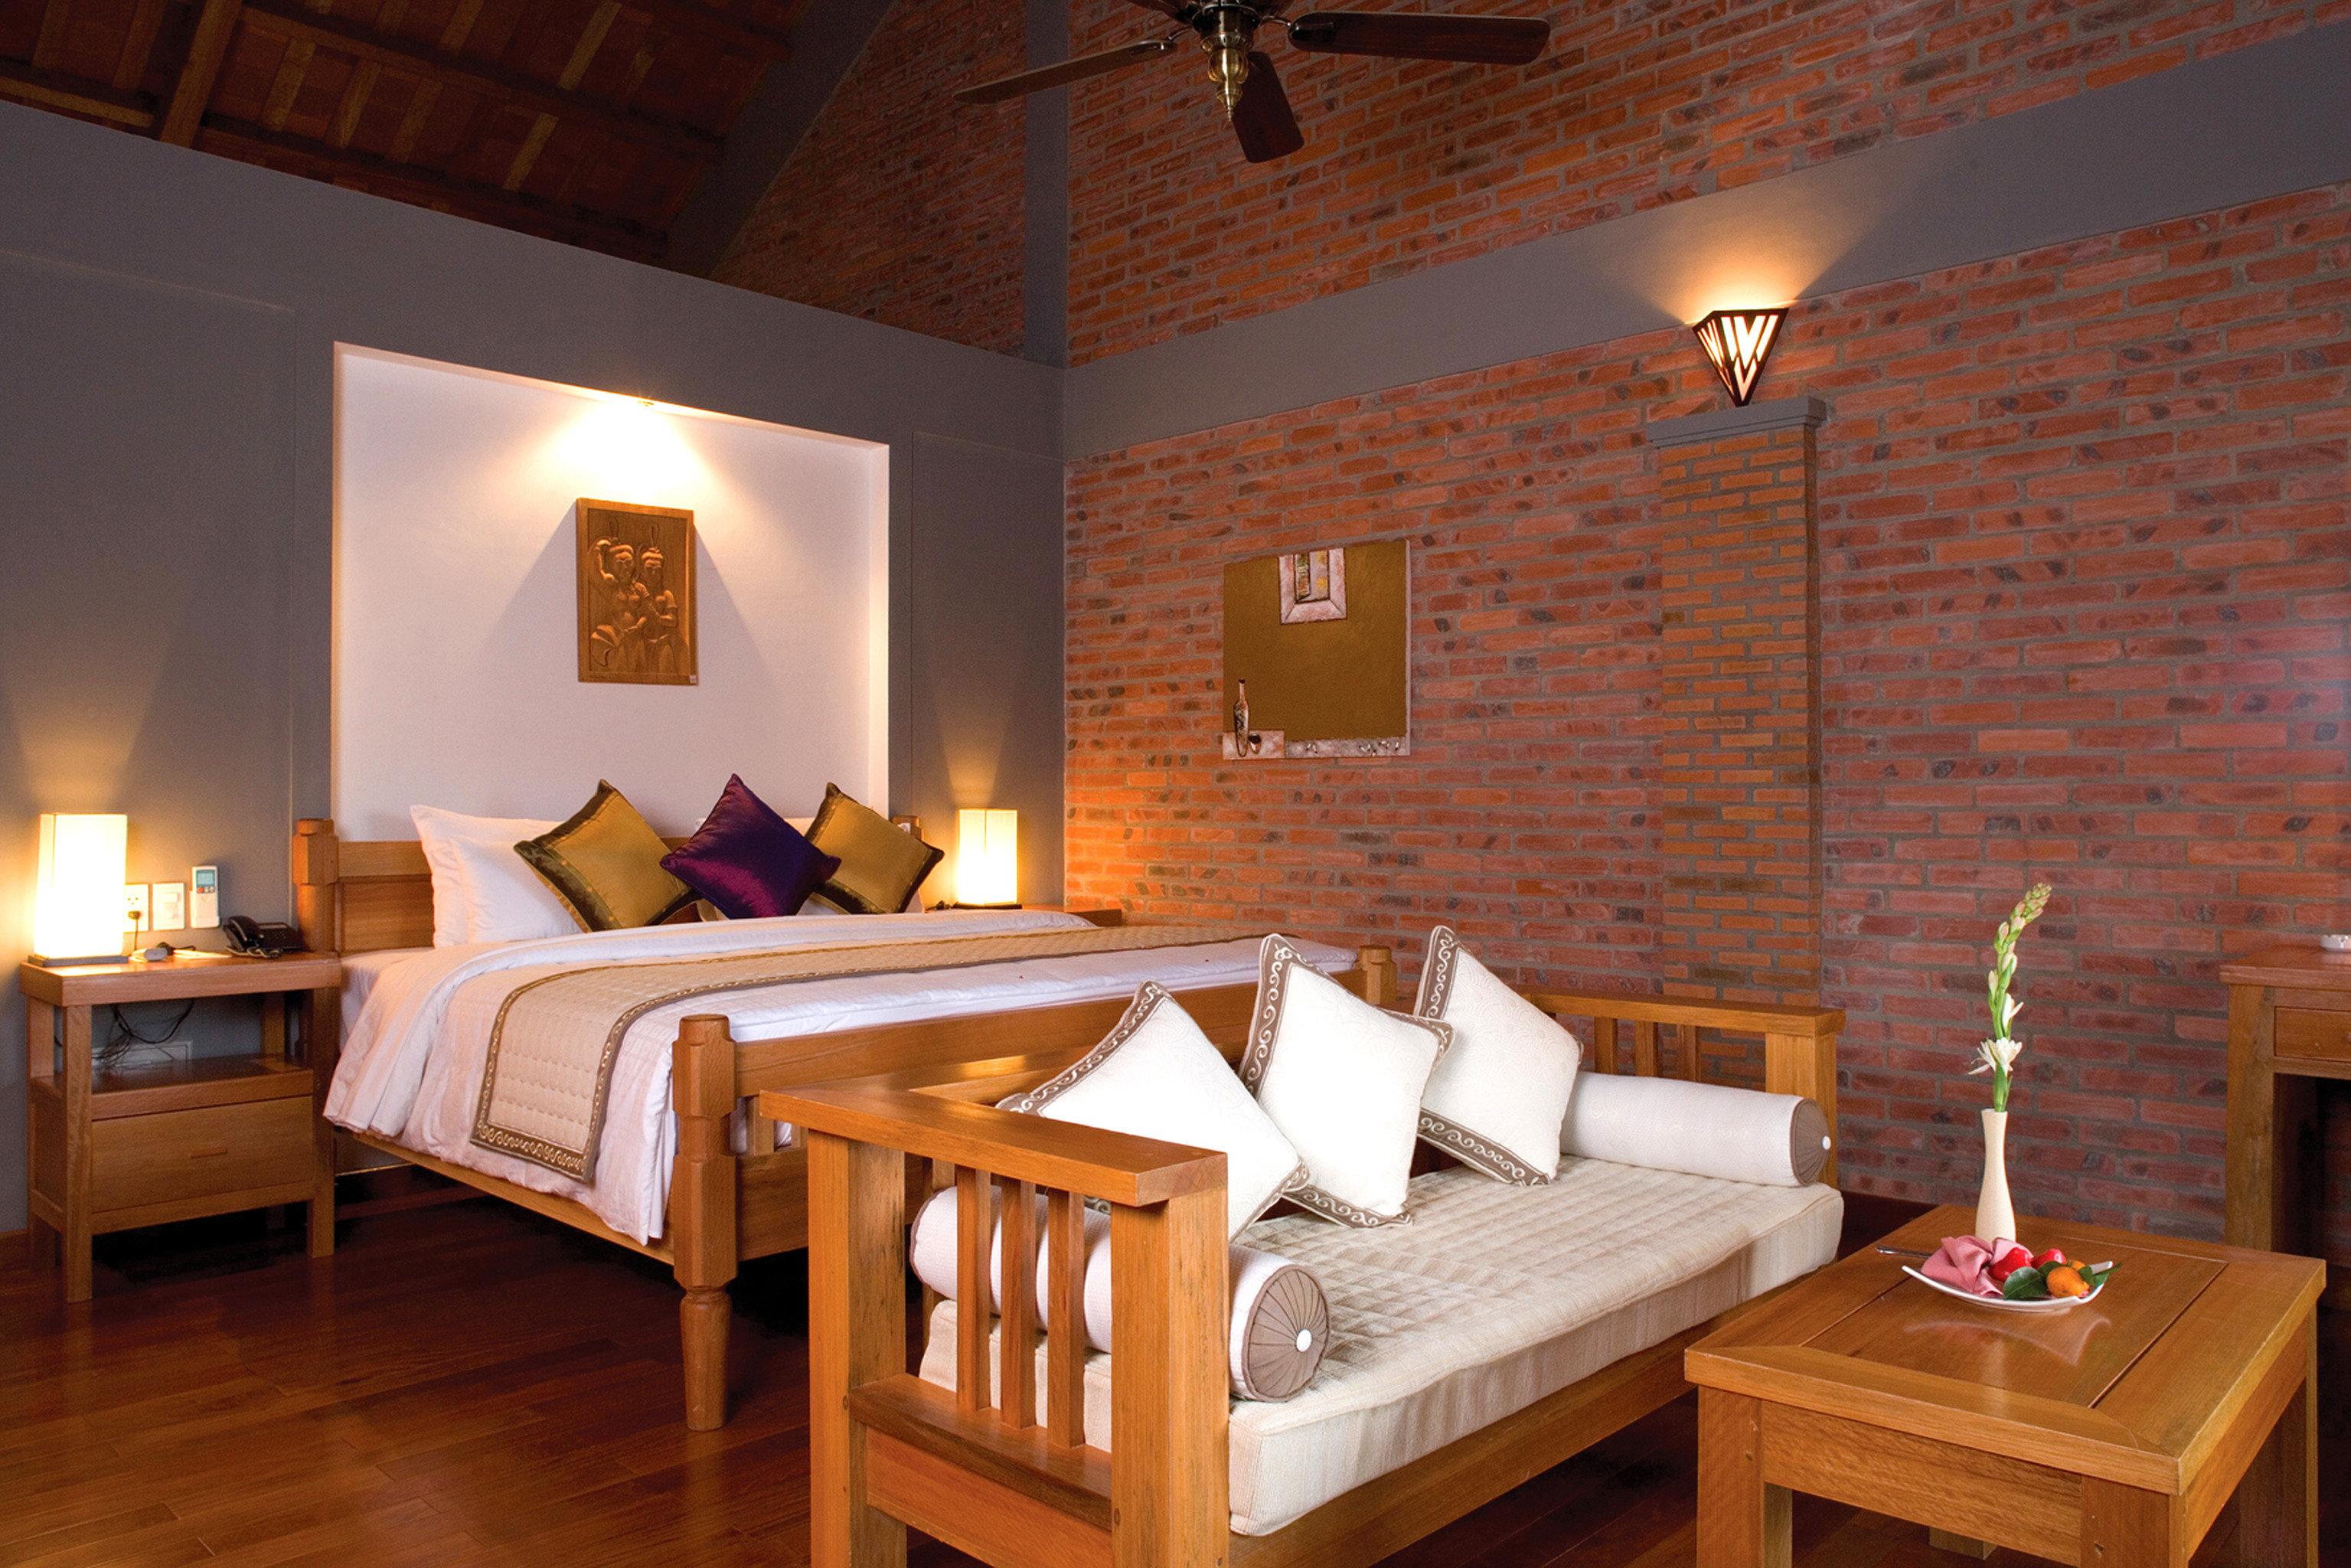 Bedroom Resort Suite property cottage hardwood home Villa farmhouse living room wood flooring